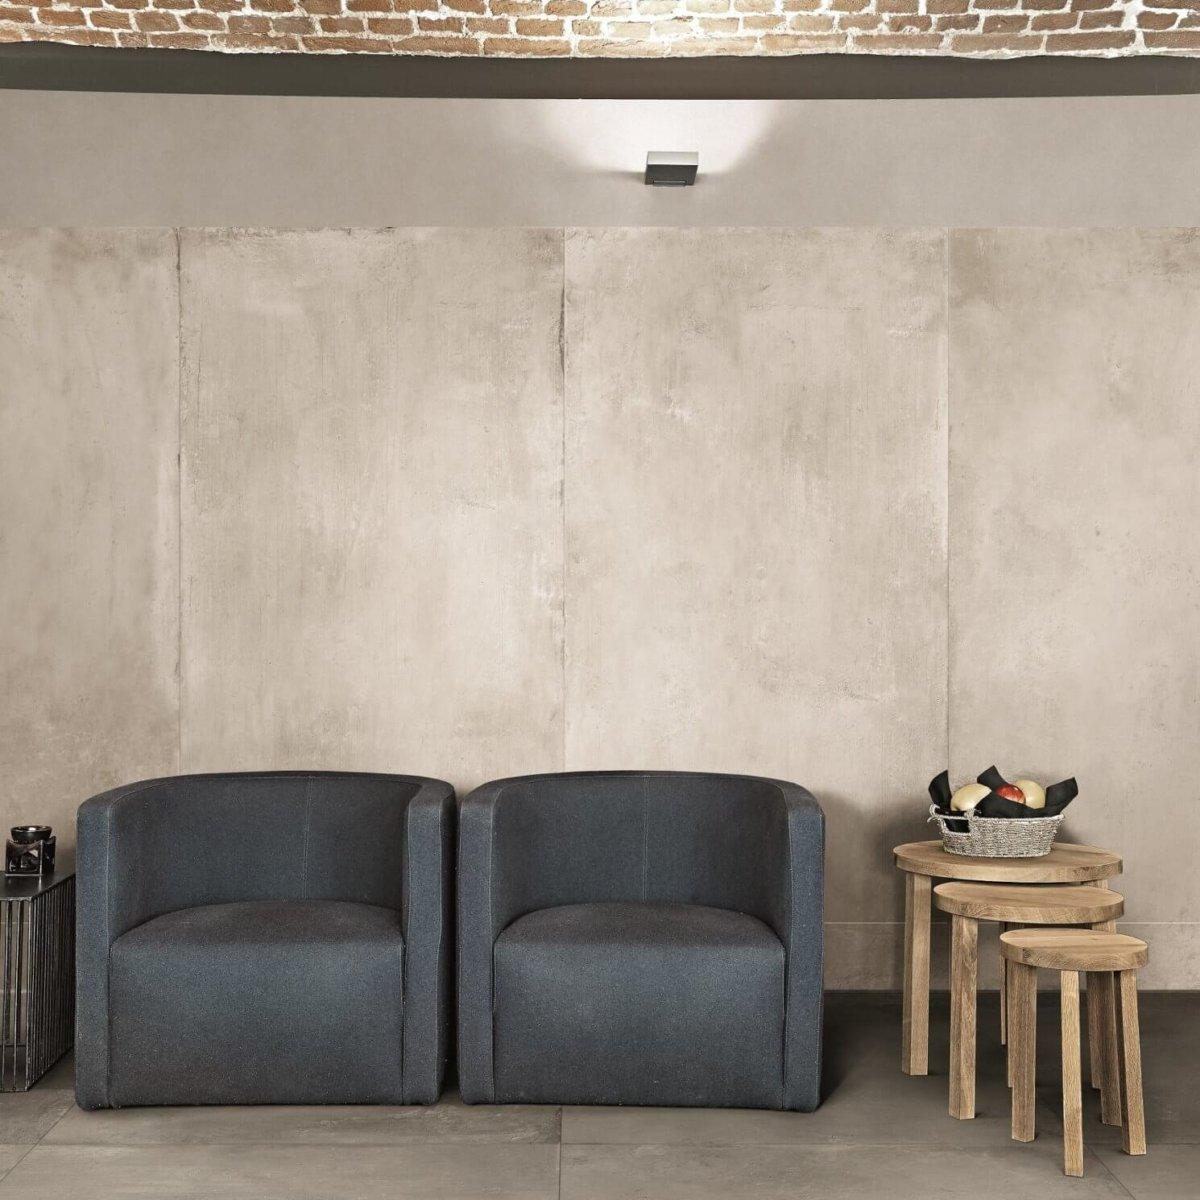 Florim Beton One Chalk 600x600mm_Stiles_Lifestyle_Image2